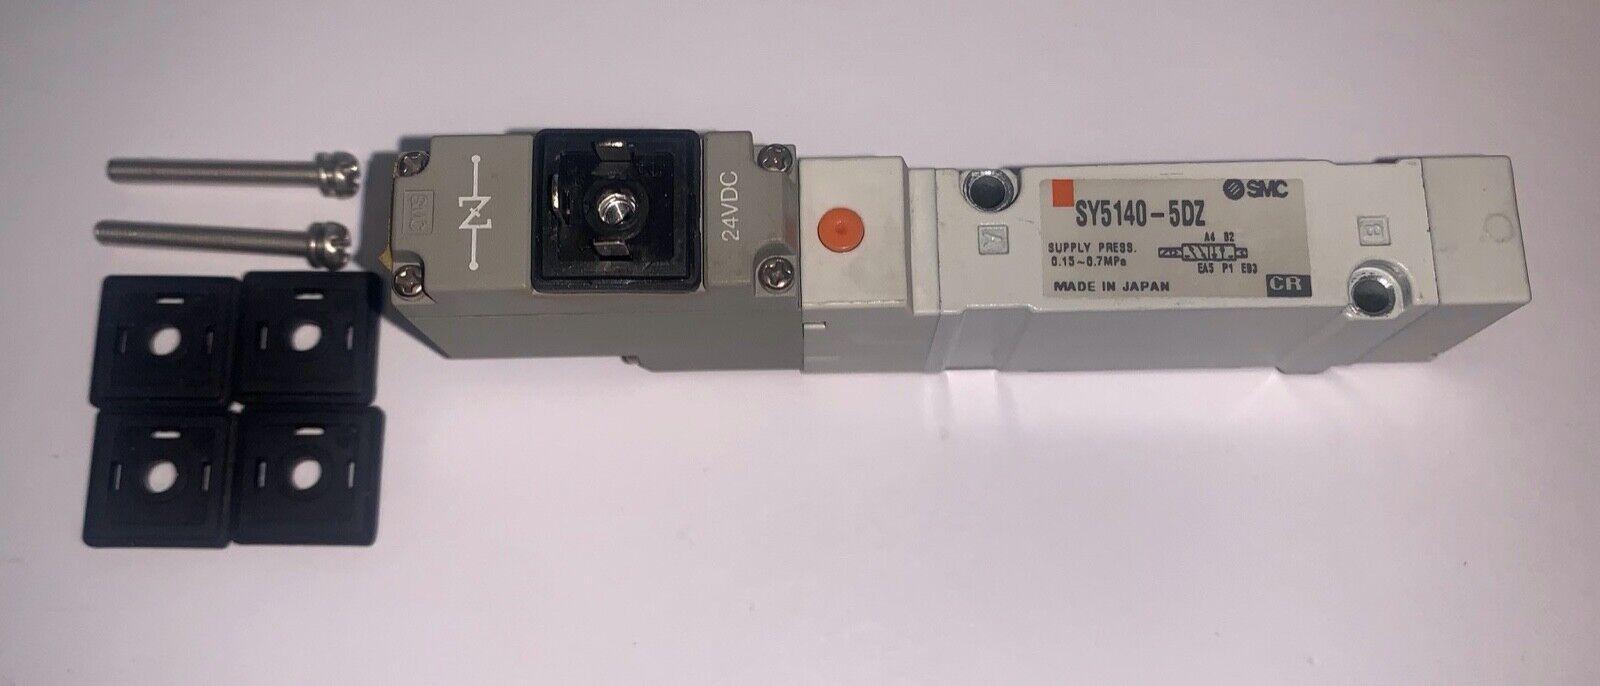 Business & Industrial SMC SY5140-5DZ-Q Pneumatic Solenoid Control ...